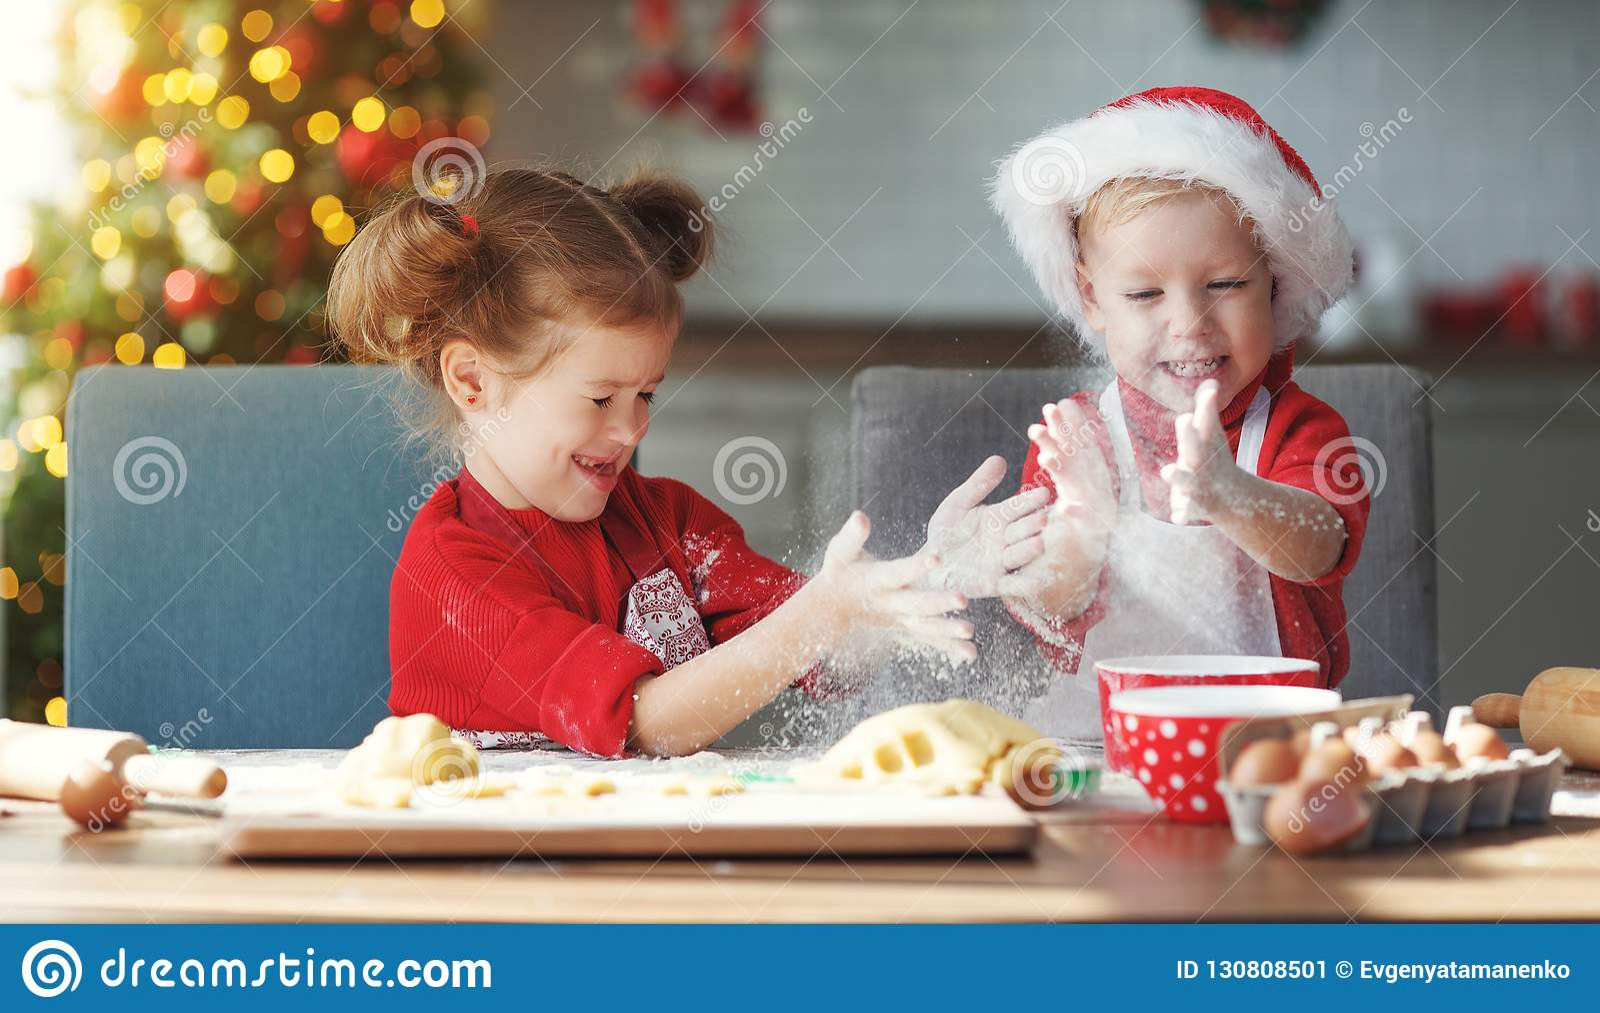 Happy Children Bake Christmas Cookies Stock Image Image Of Family